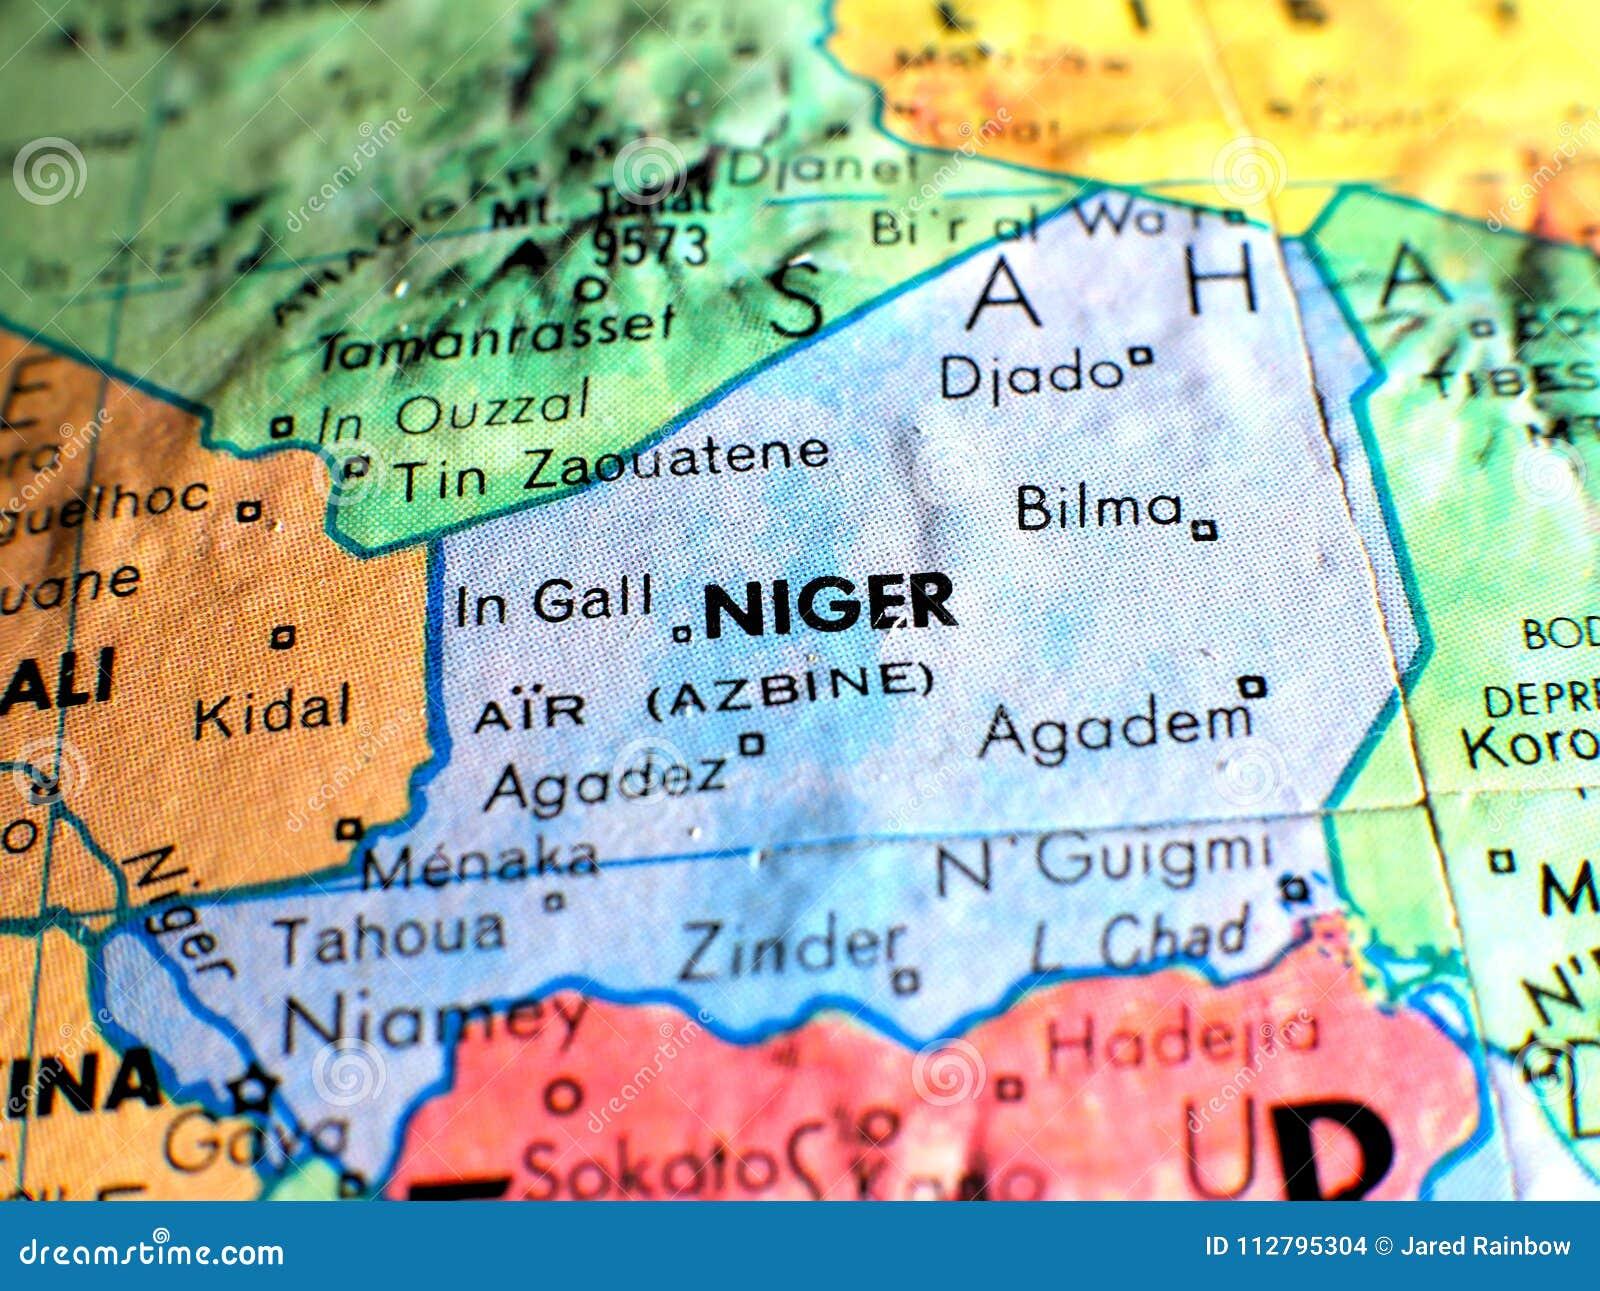 Niger Africa Focus Macro Shot On Globe Map For Travel Blogs Social